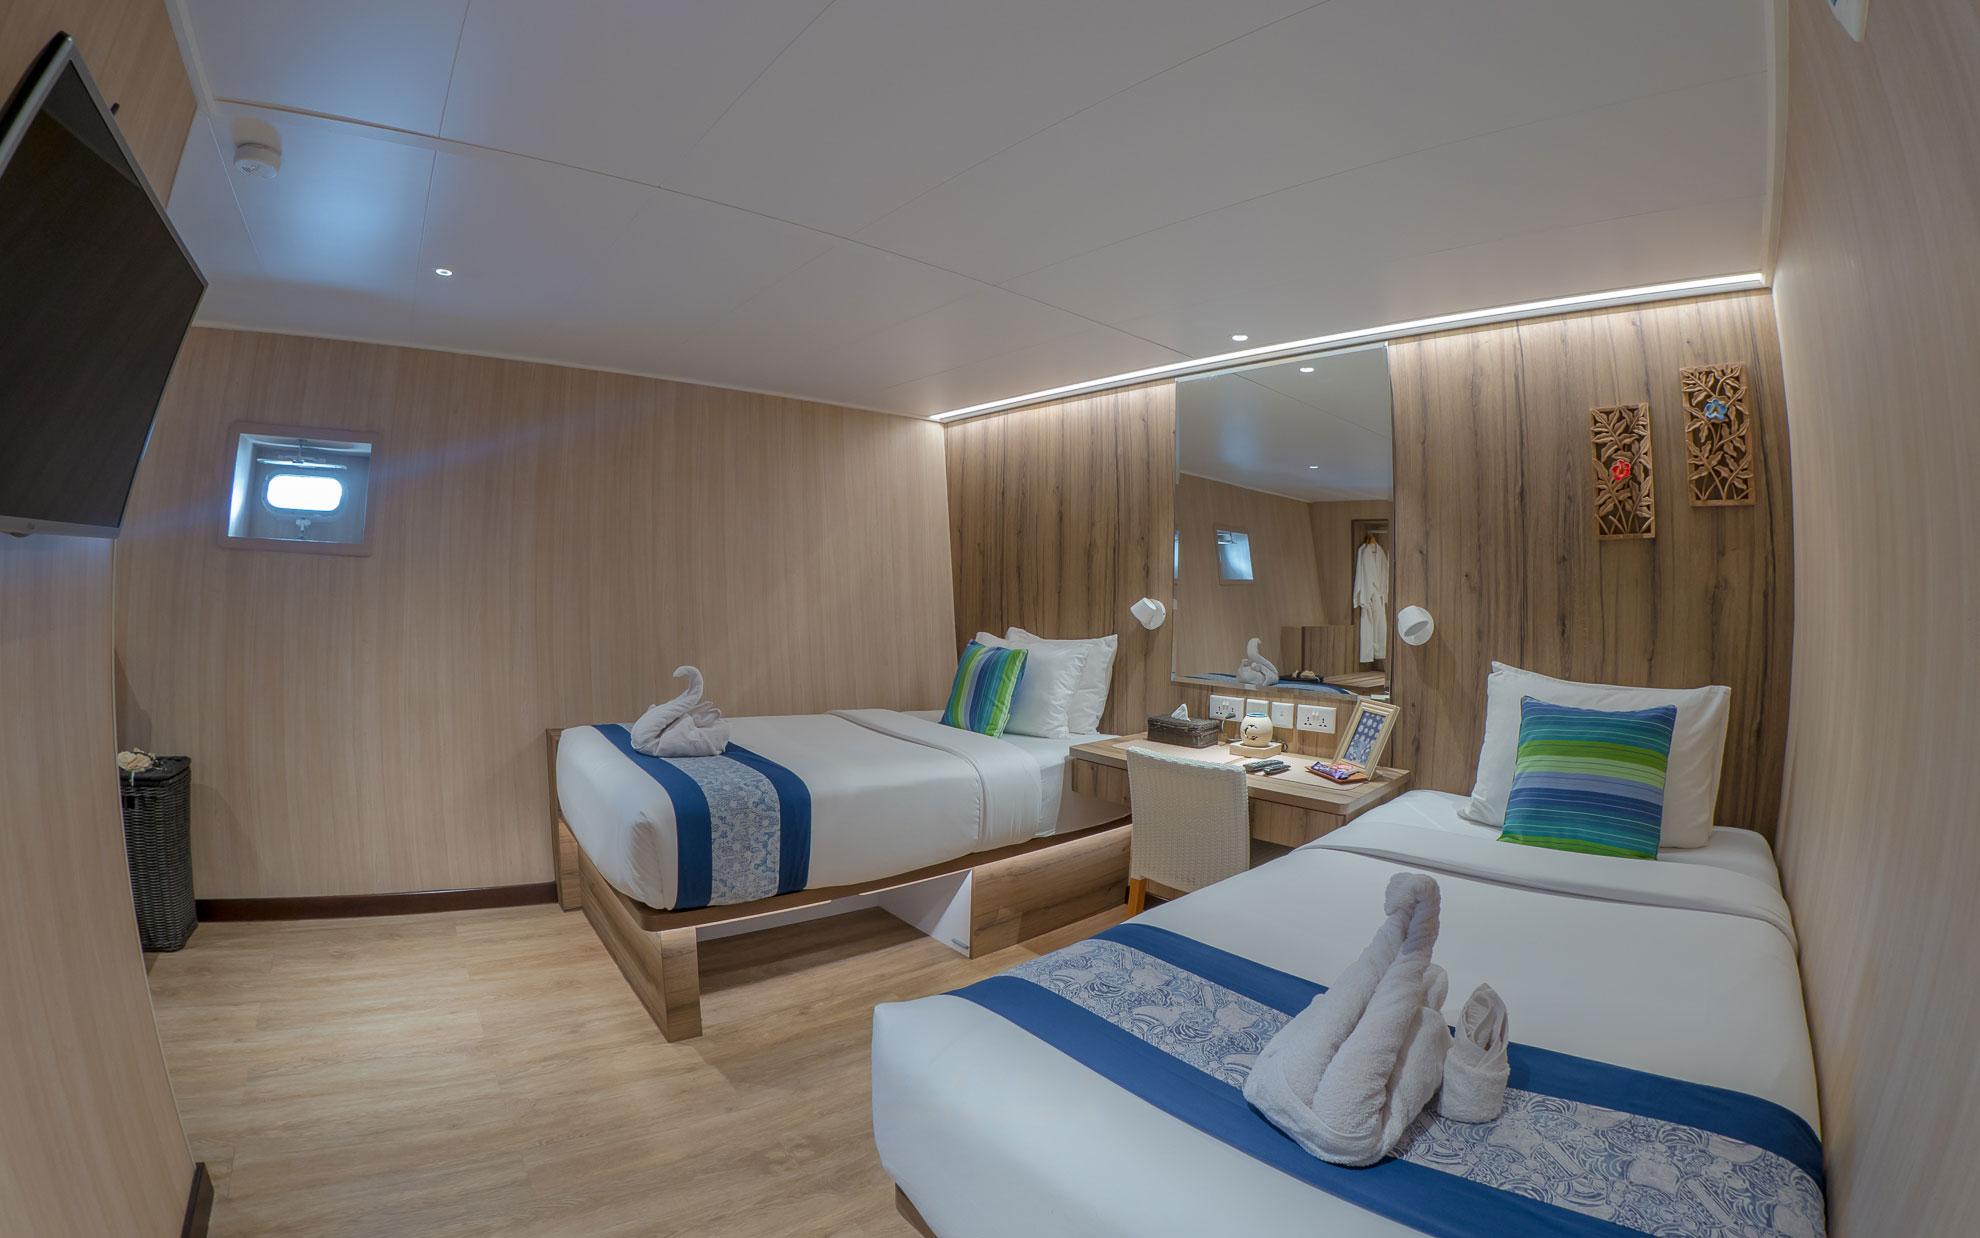 Dive Gaia - Gaia Love- Luxury Lower Deck Cabins